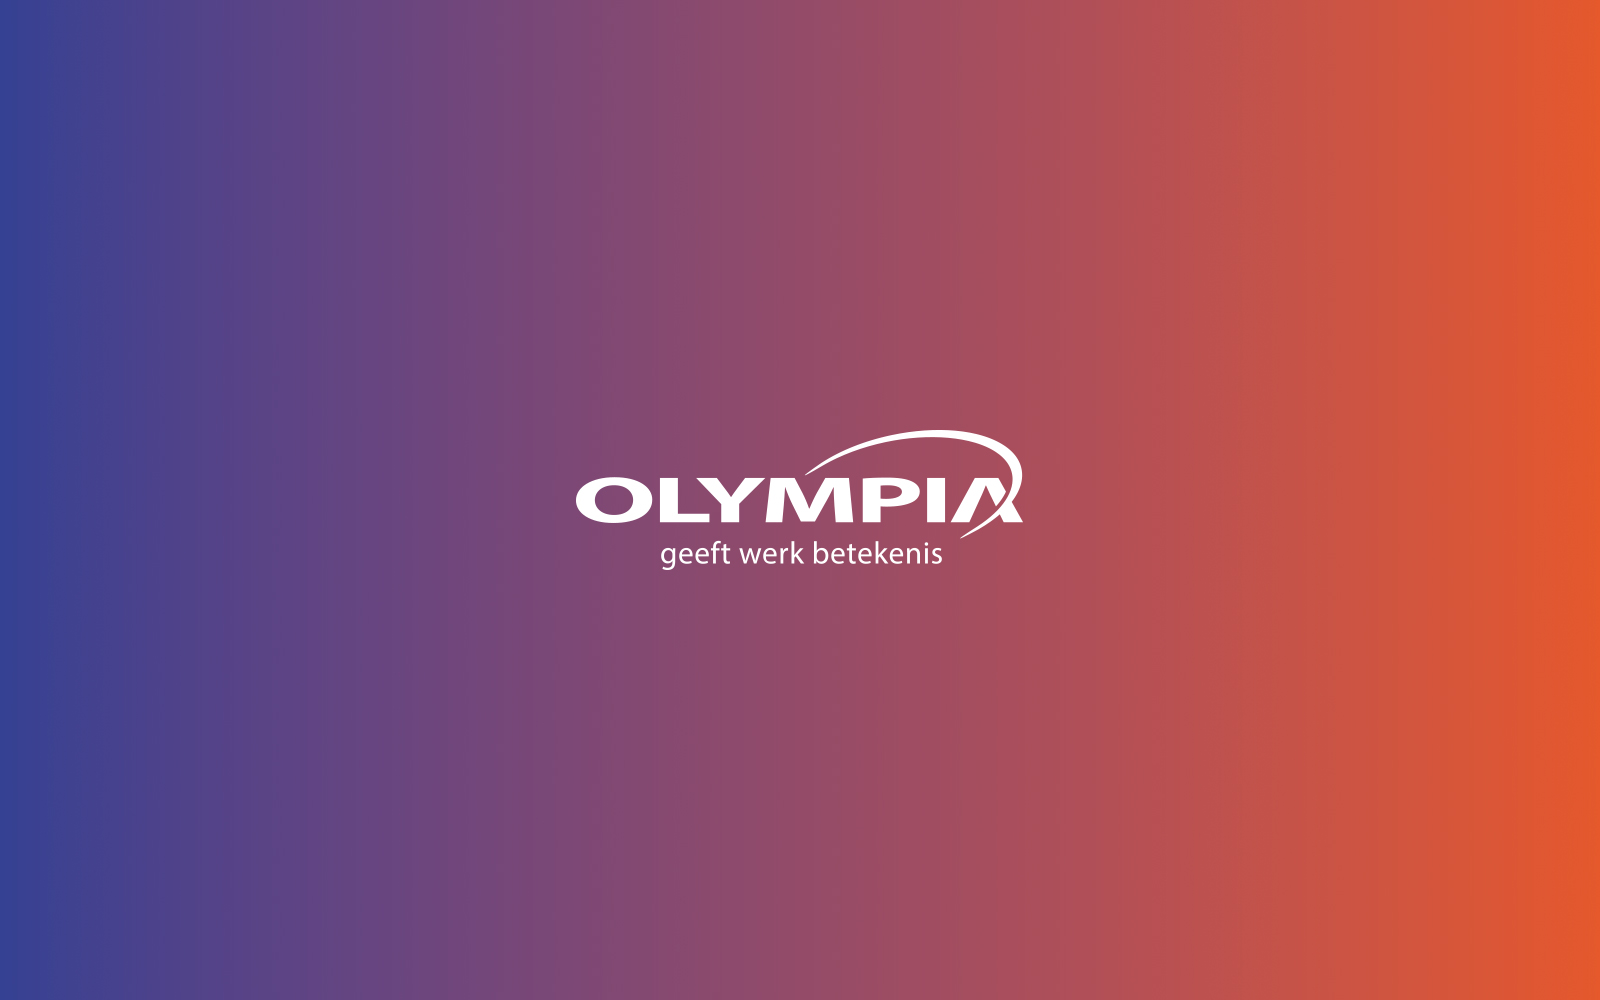 olympia_3